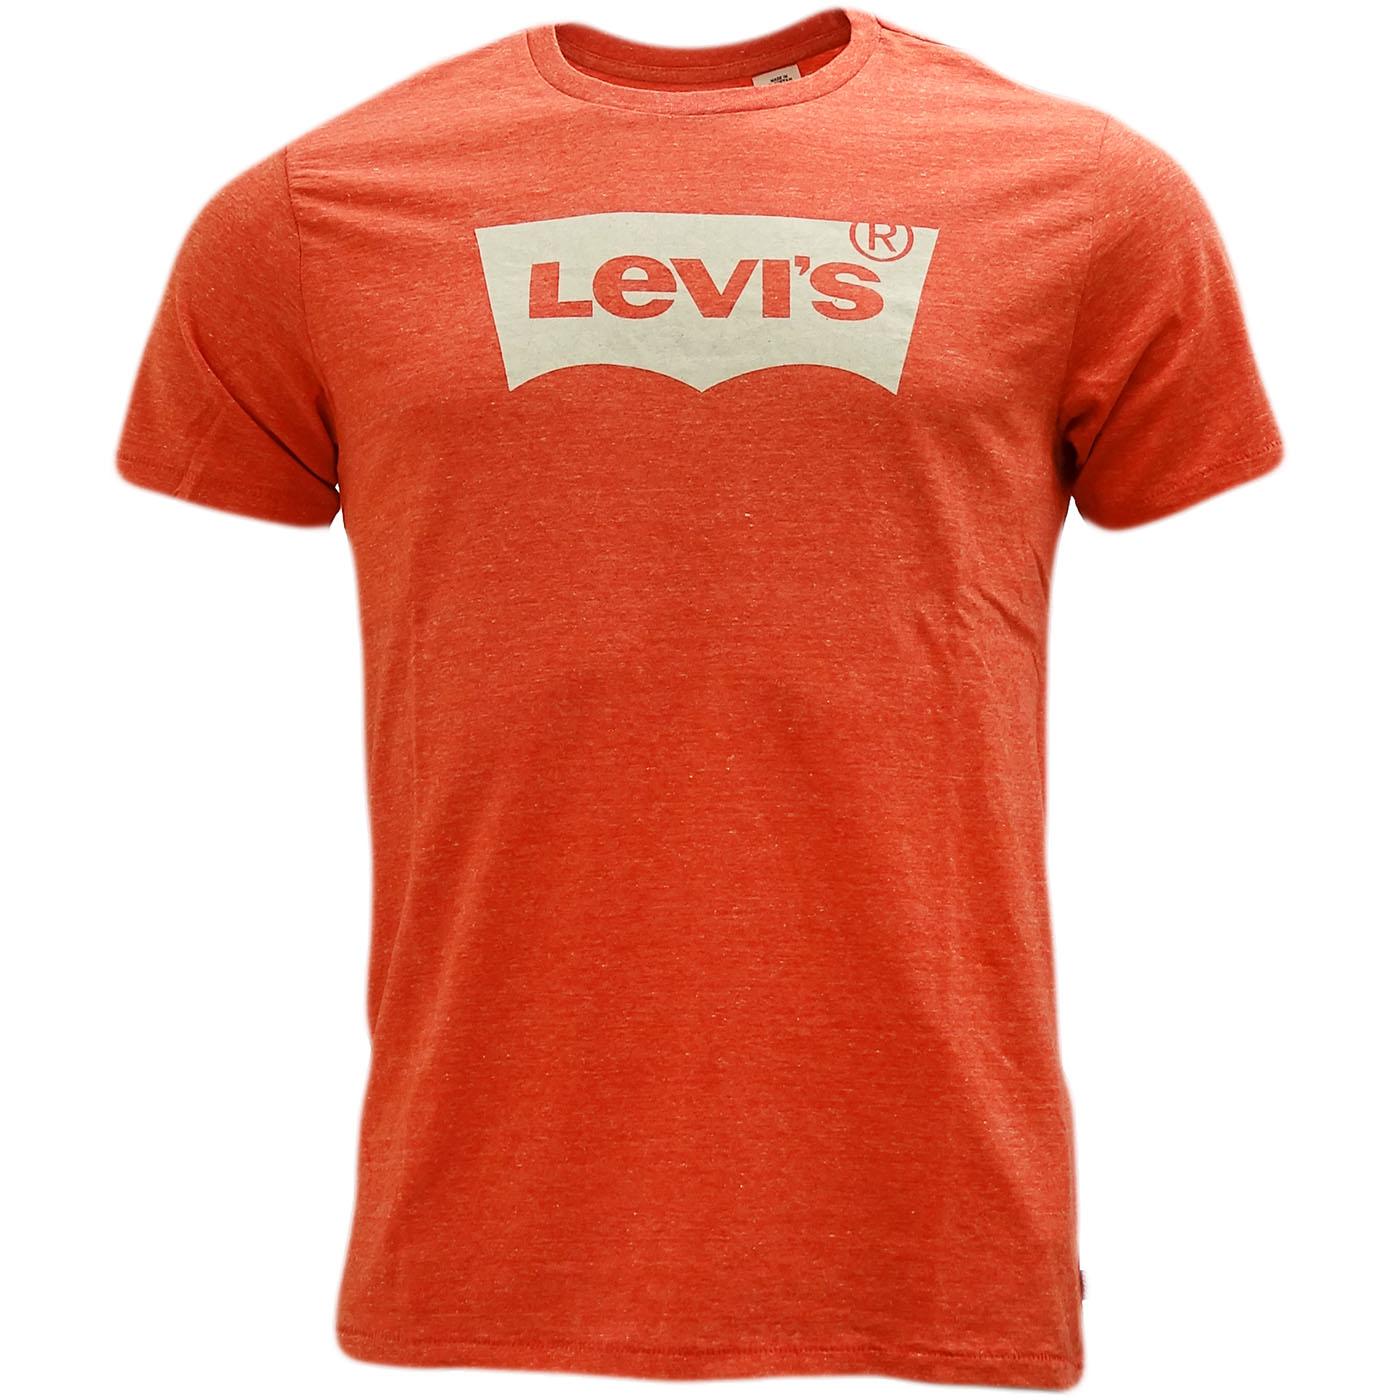 Levi-Strauss-a-pipistrello-t-shirt-22489